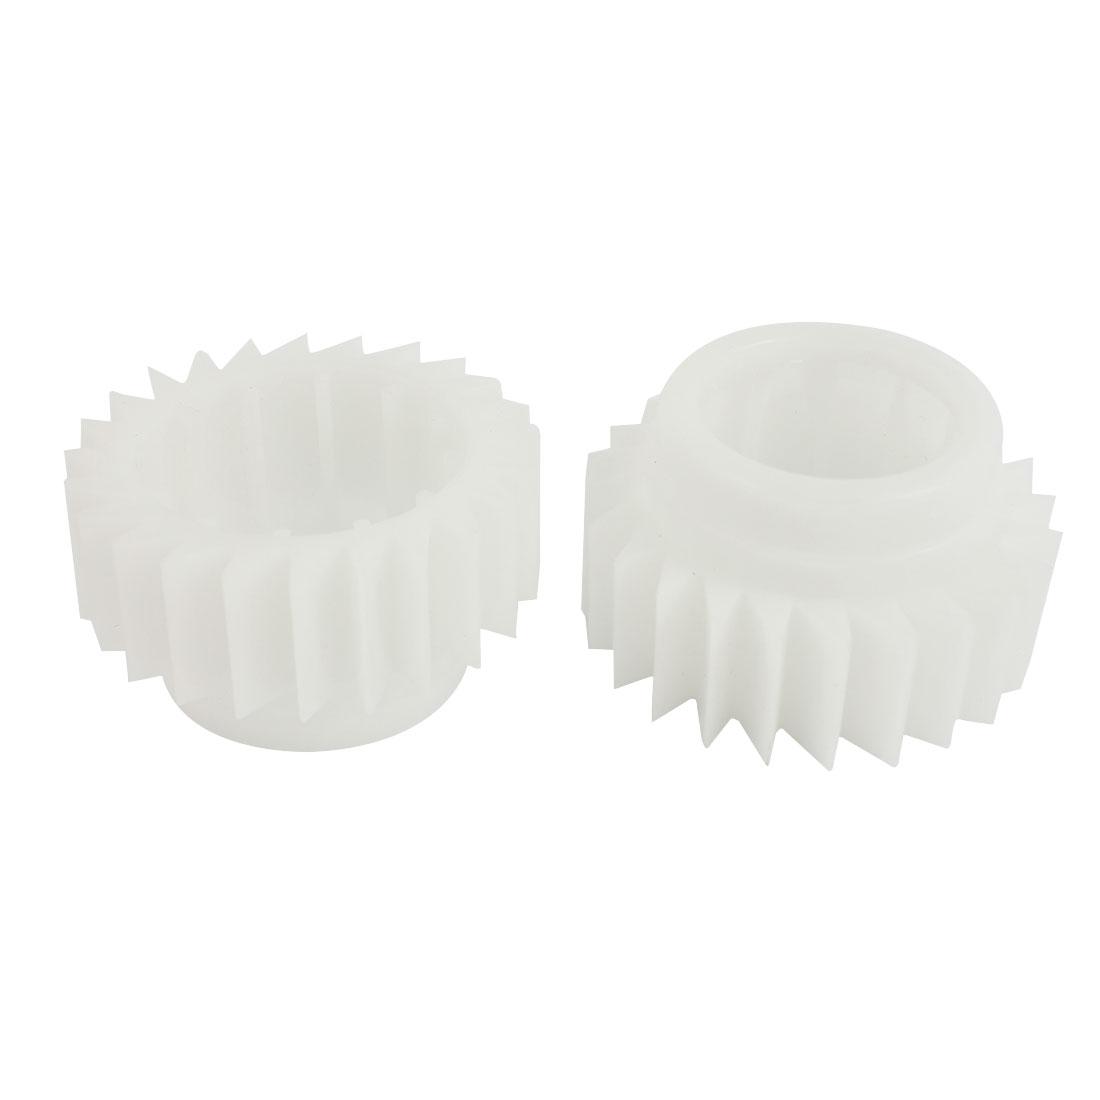 2PCS White Plastic 24 Teeth Clutch Ratchet Wheel for Little Swan Washing Machine